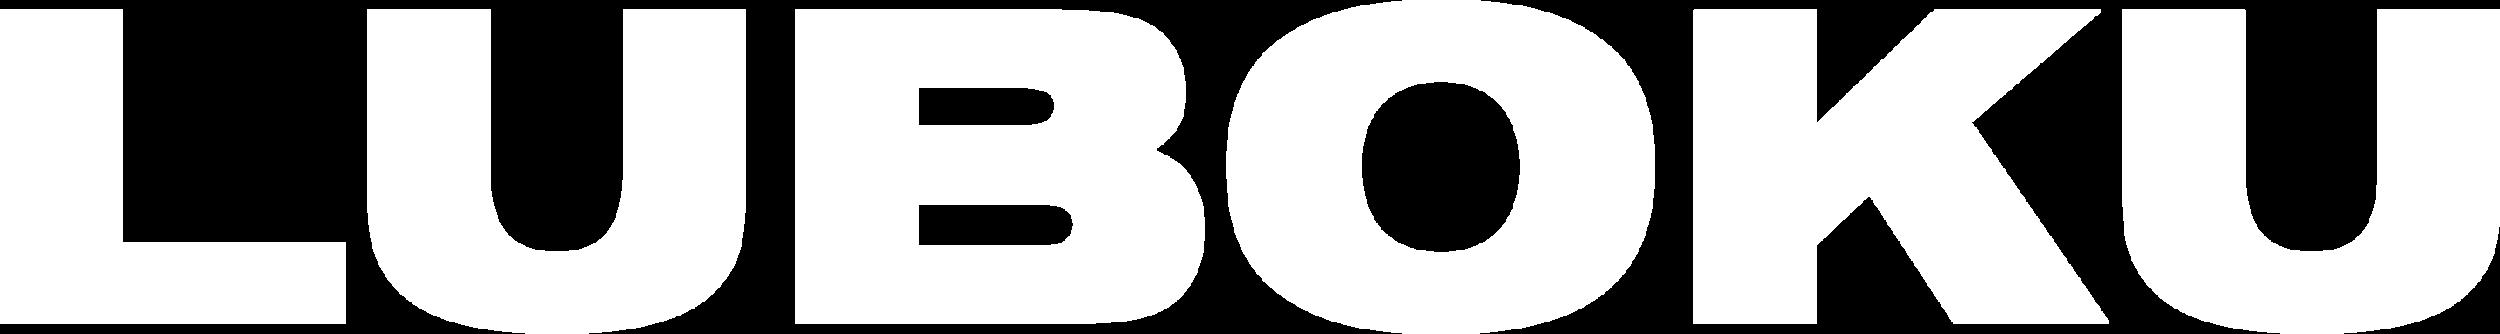 Luboku-logo (W).png